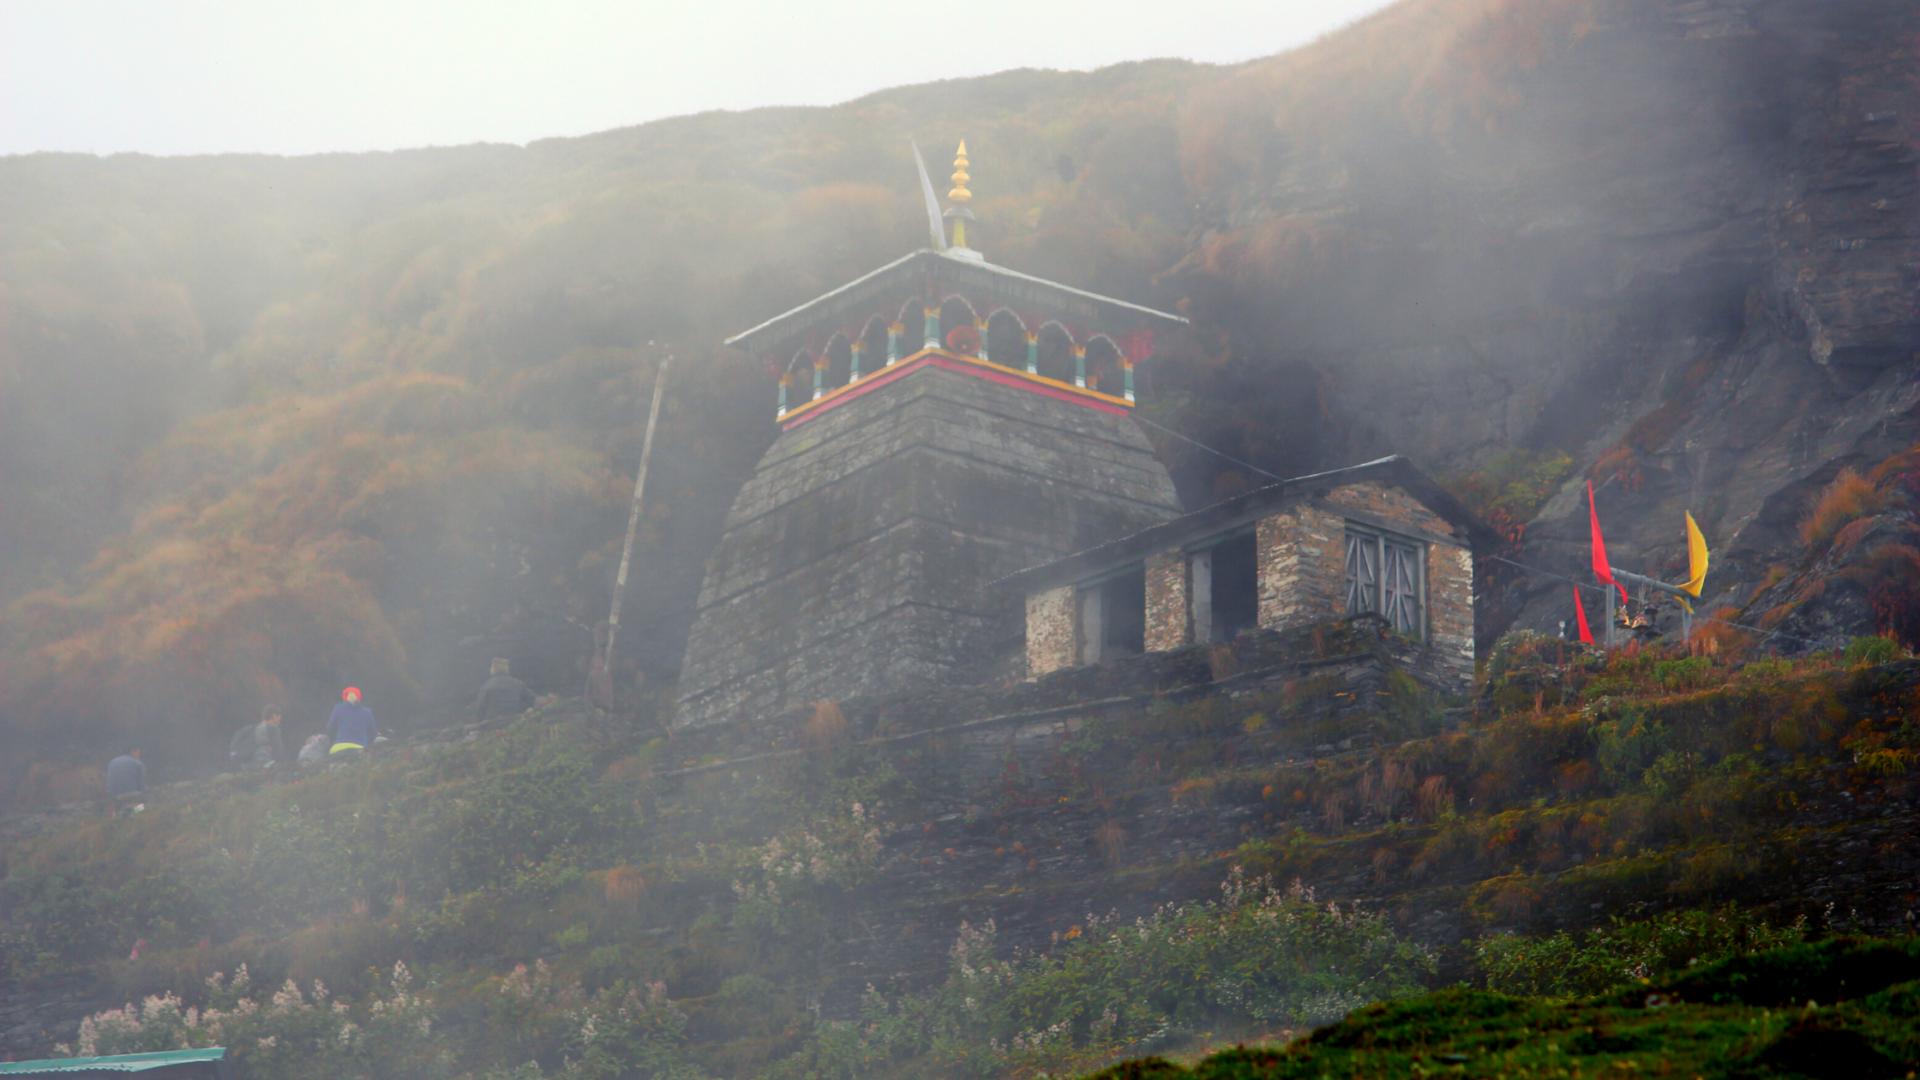 Tungnath Darshan and Chandrashila Summit (Day 2)